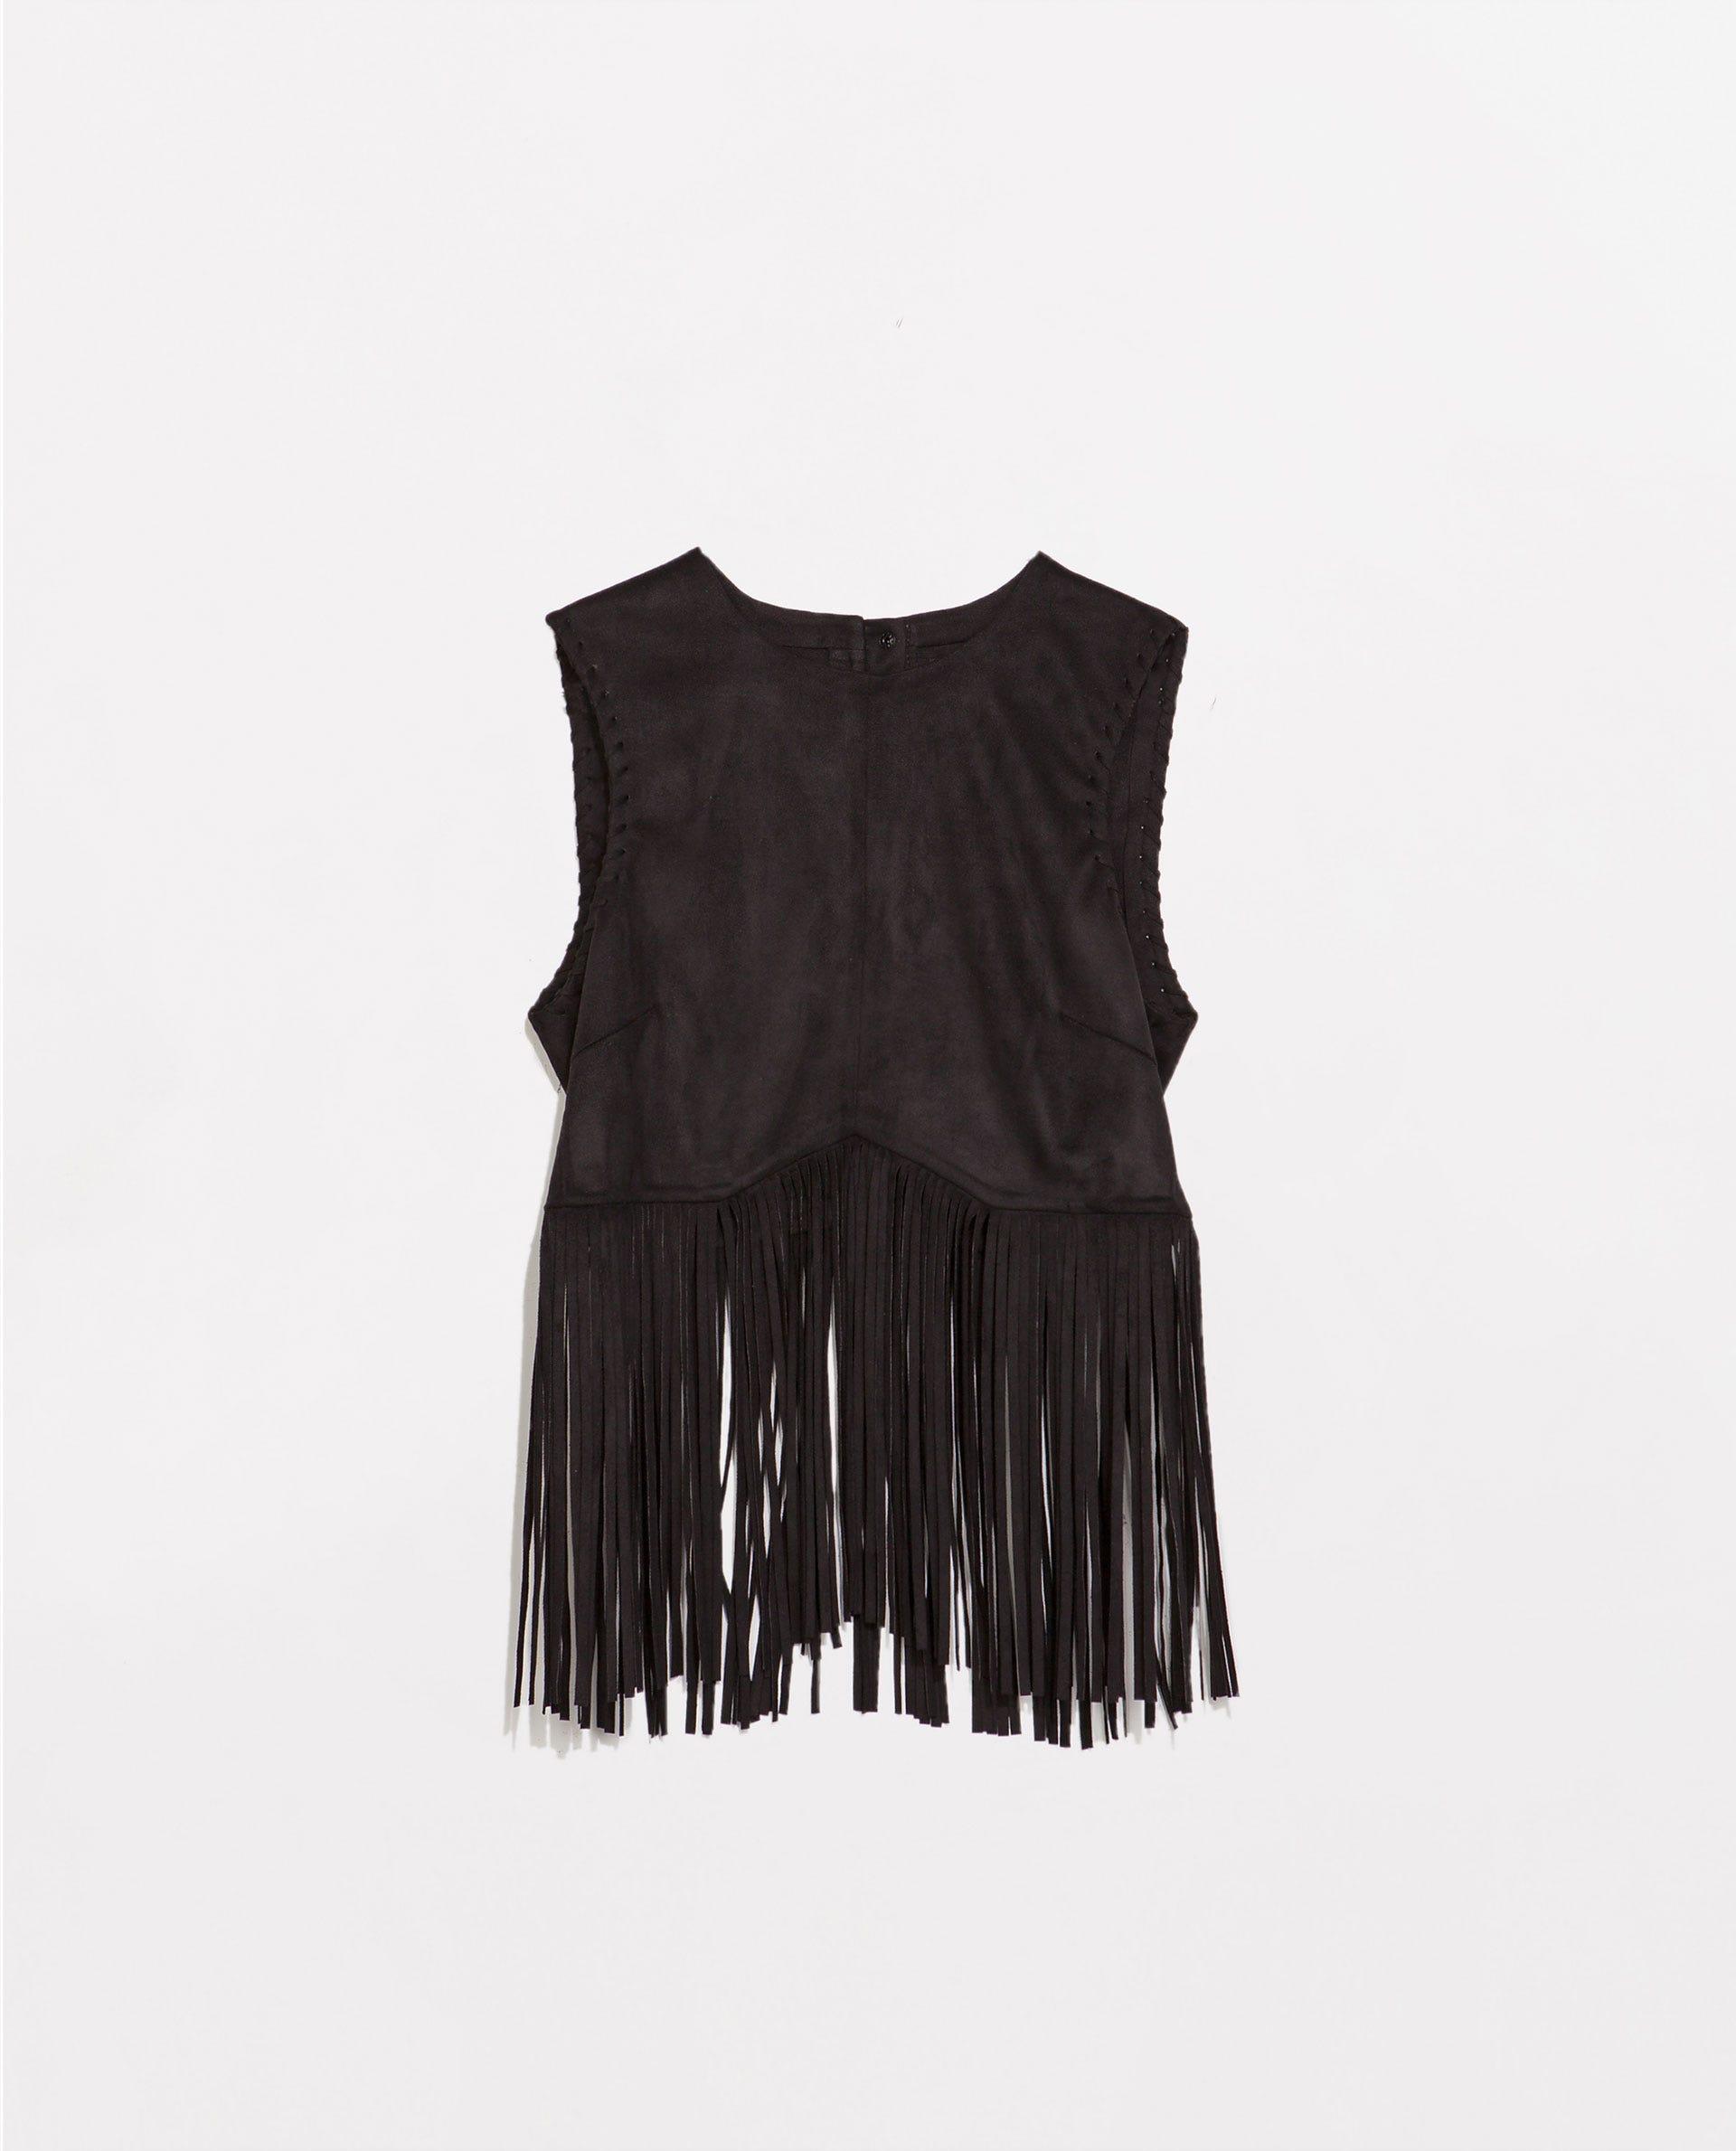 Black dress meaning - Black Dress Dream Meaning Quarter